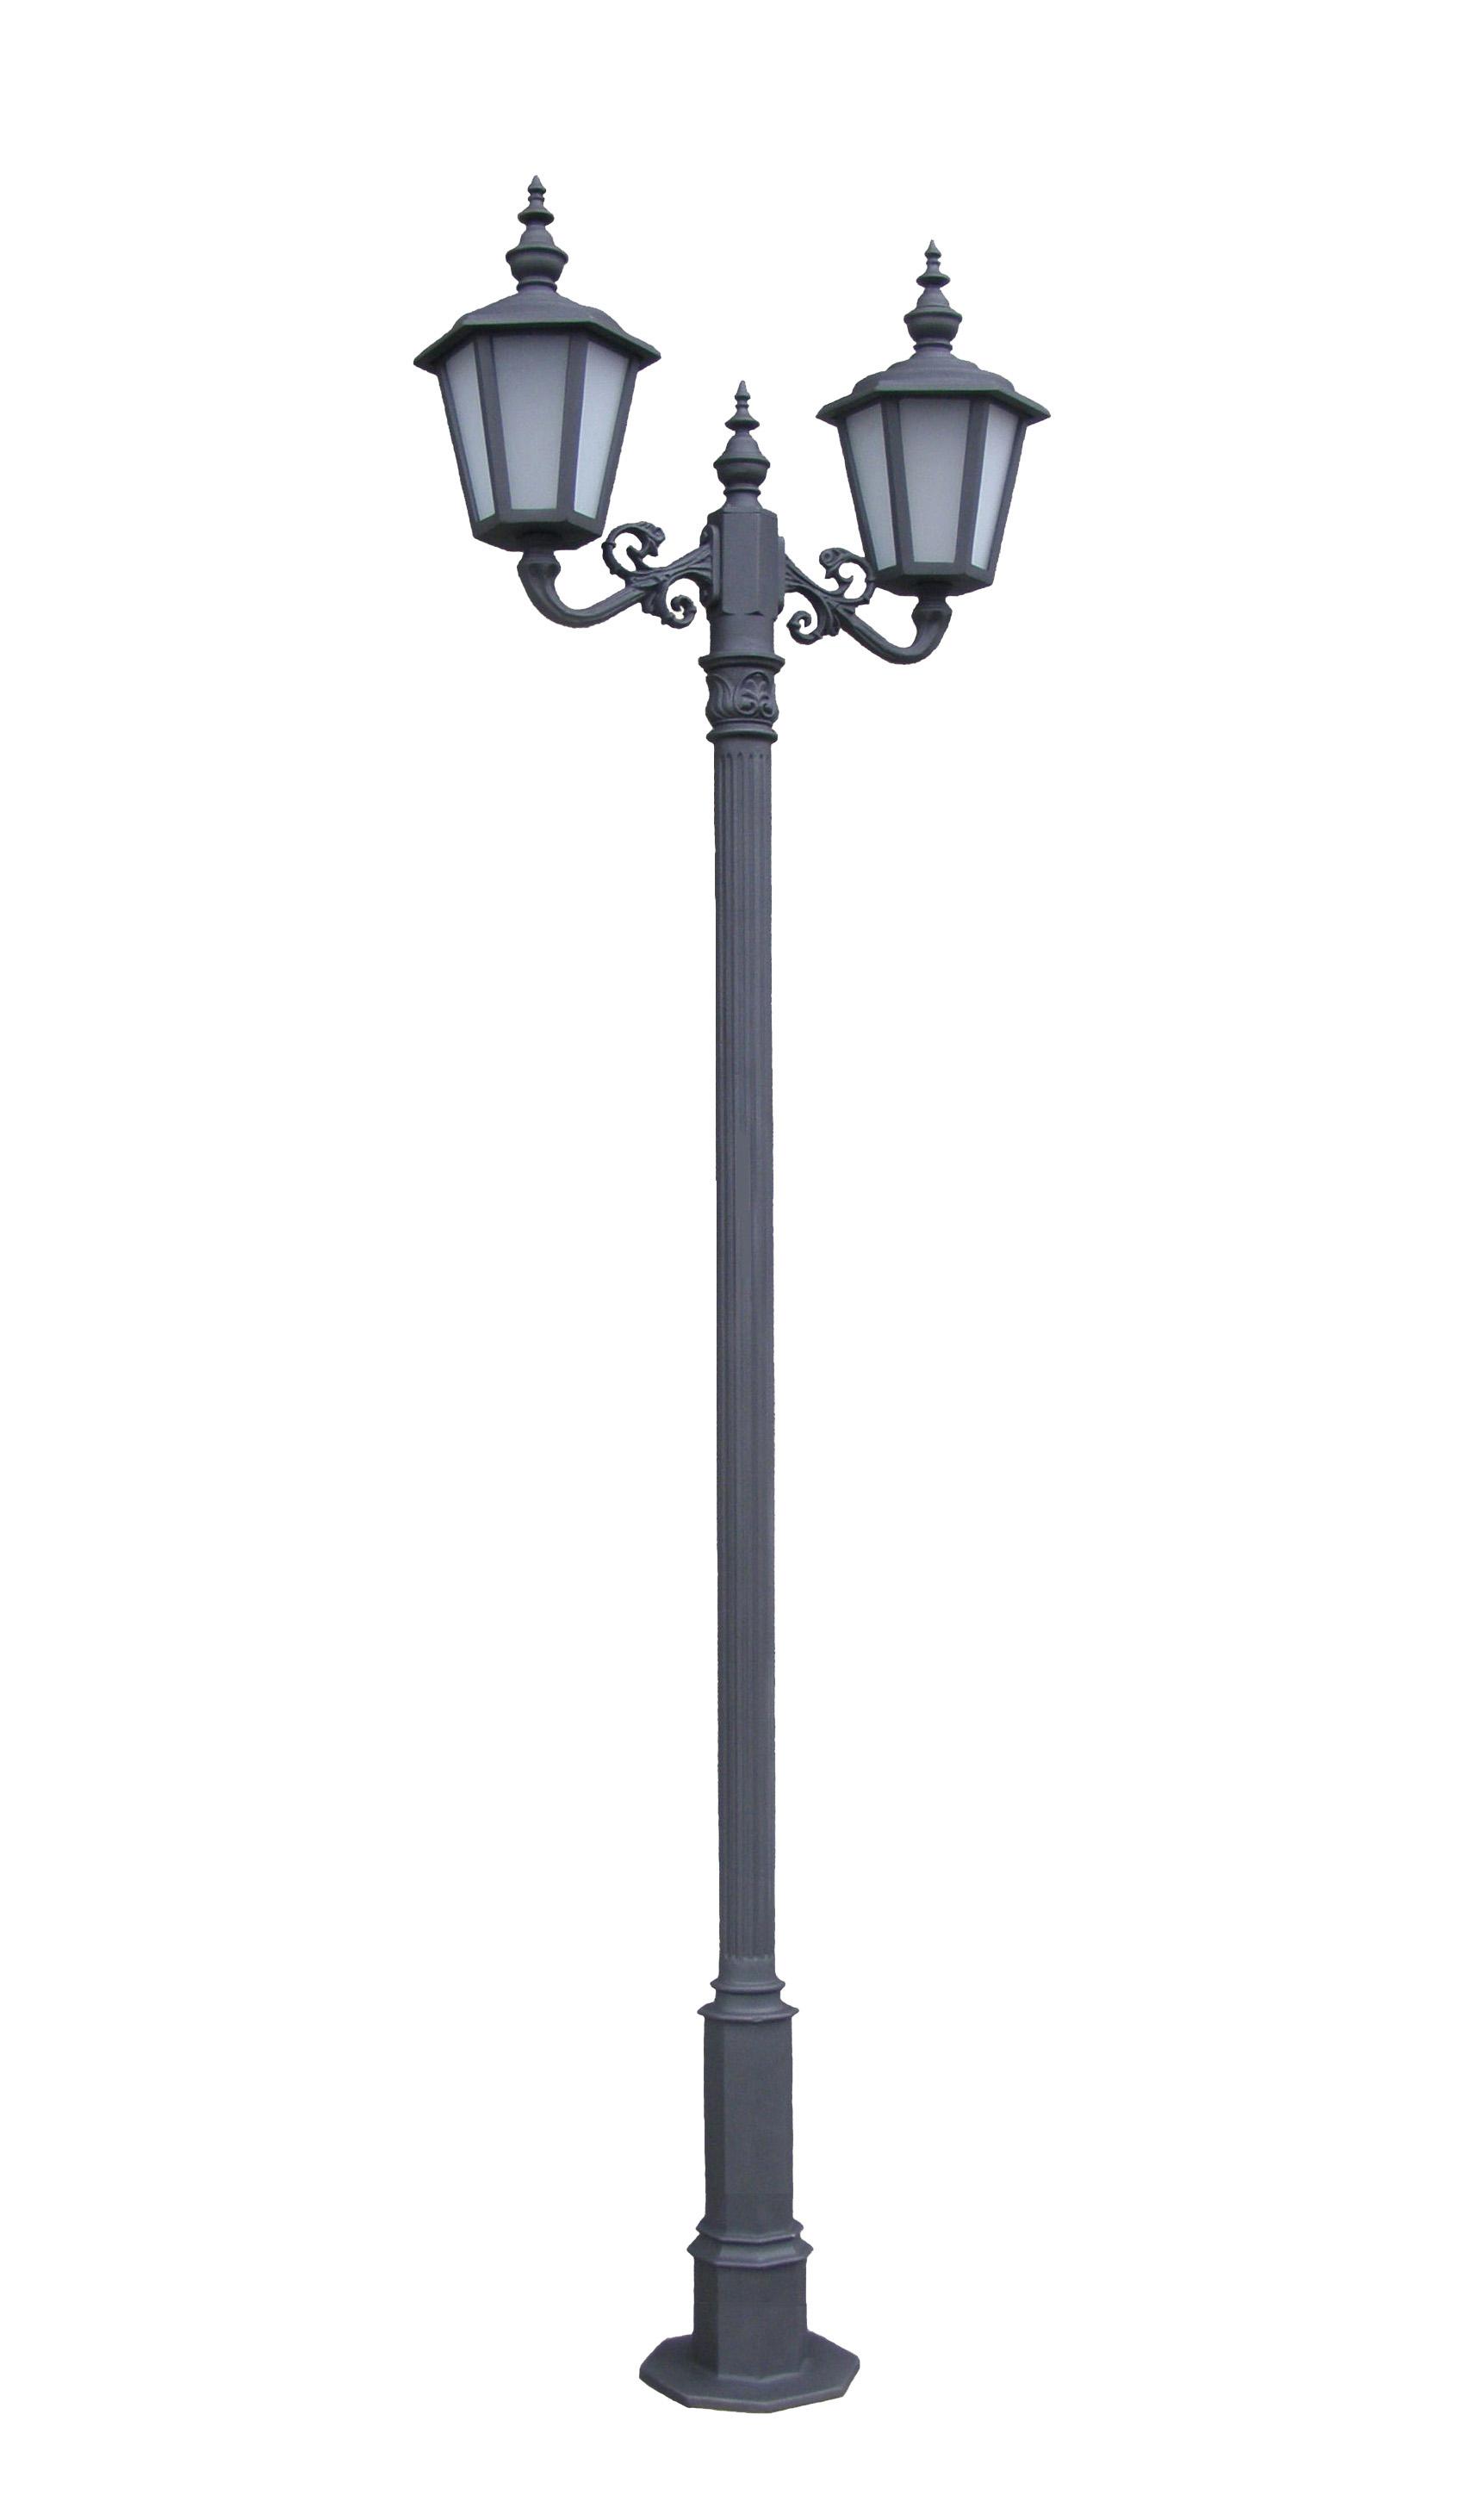 Stalpi ornamentali pentru iluminat stradal, parcuri, gradini BRAMAL LIGHT - Poza 10